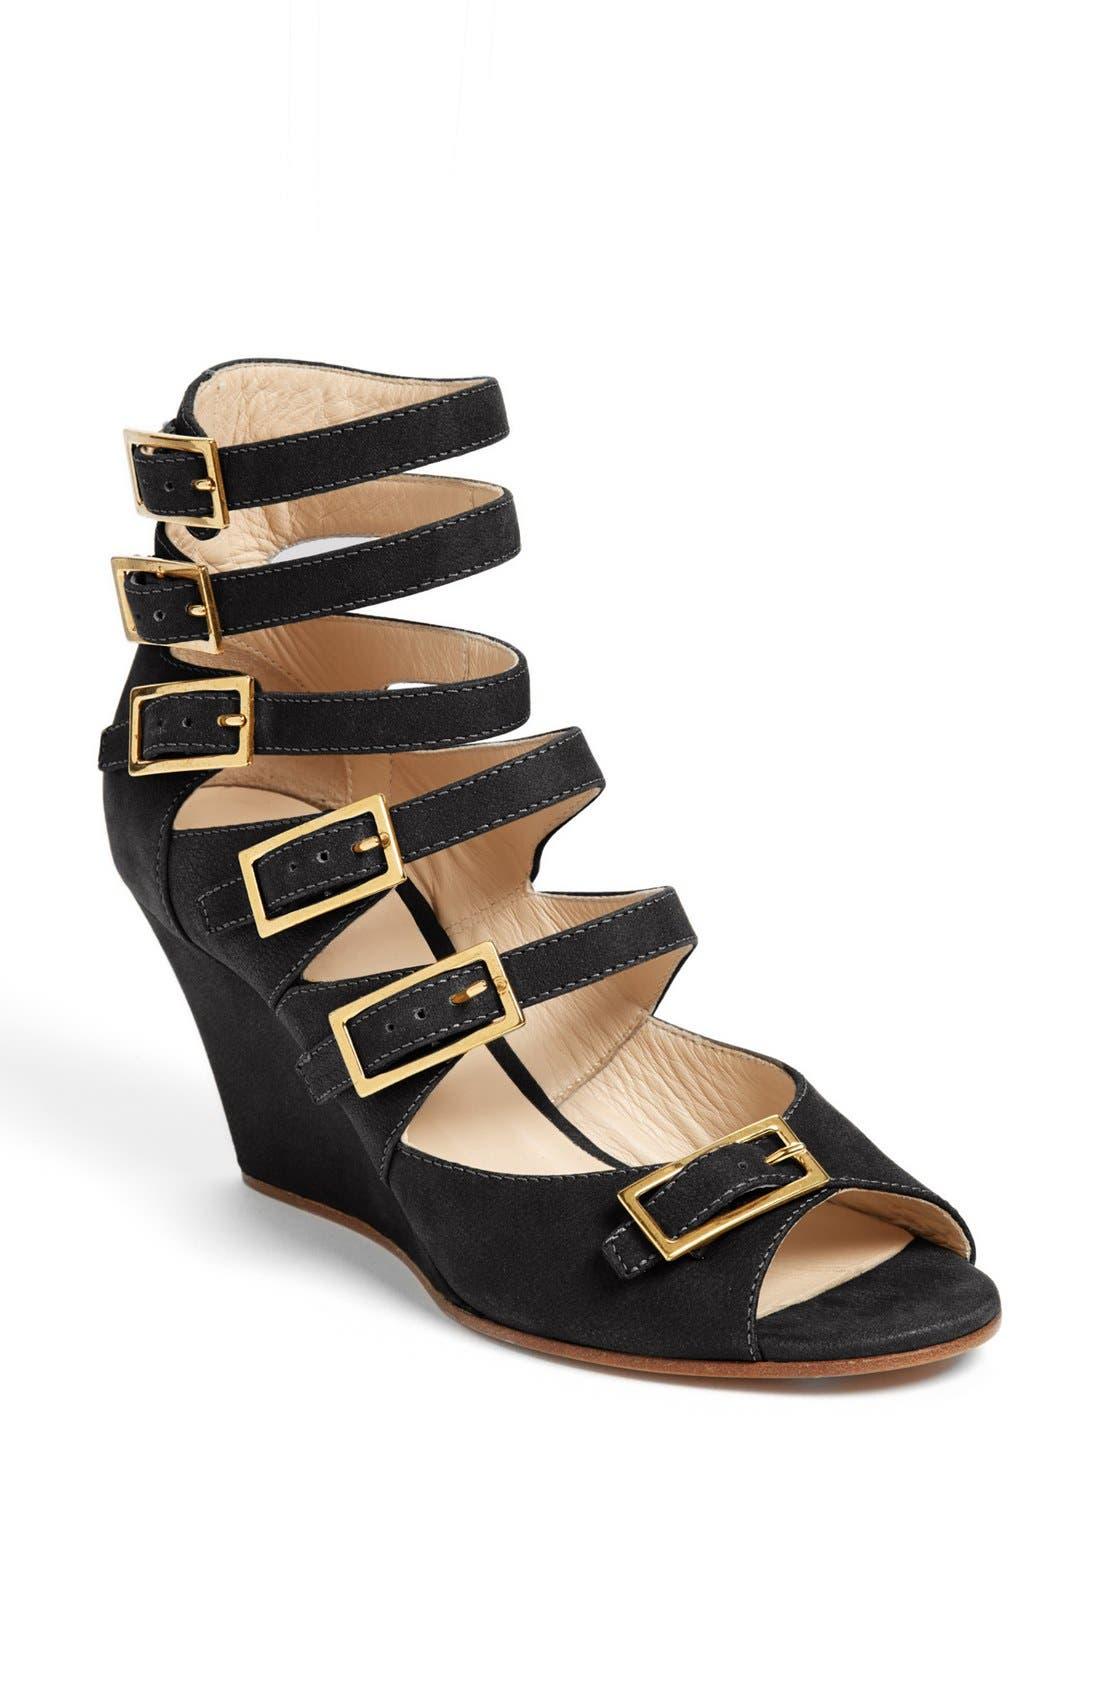 Main Image - Chloé 'Arce' Multi Strap Wedge Sandal